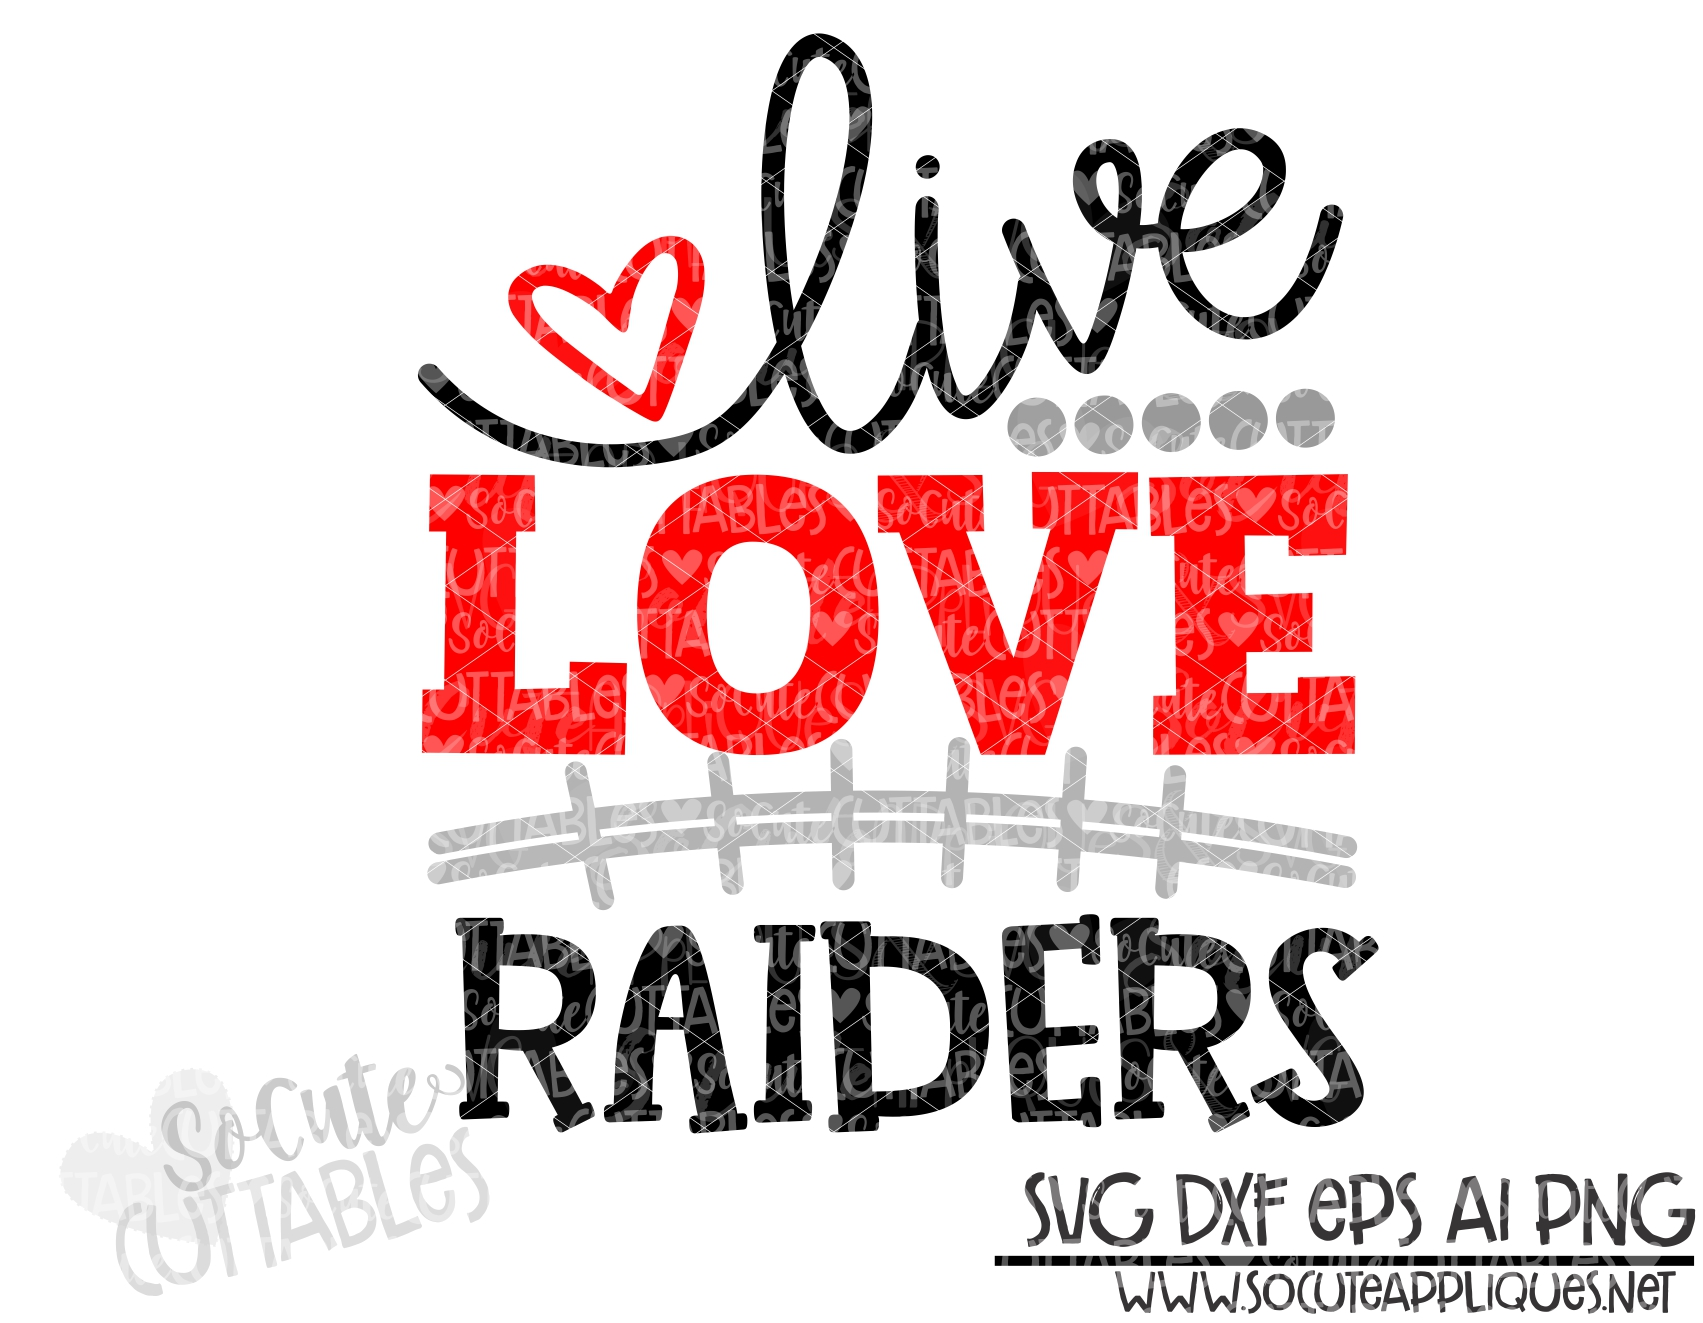 Download Live love Raiders football svg scc 19 - socuteappliques.net